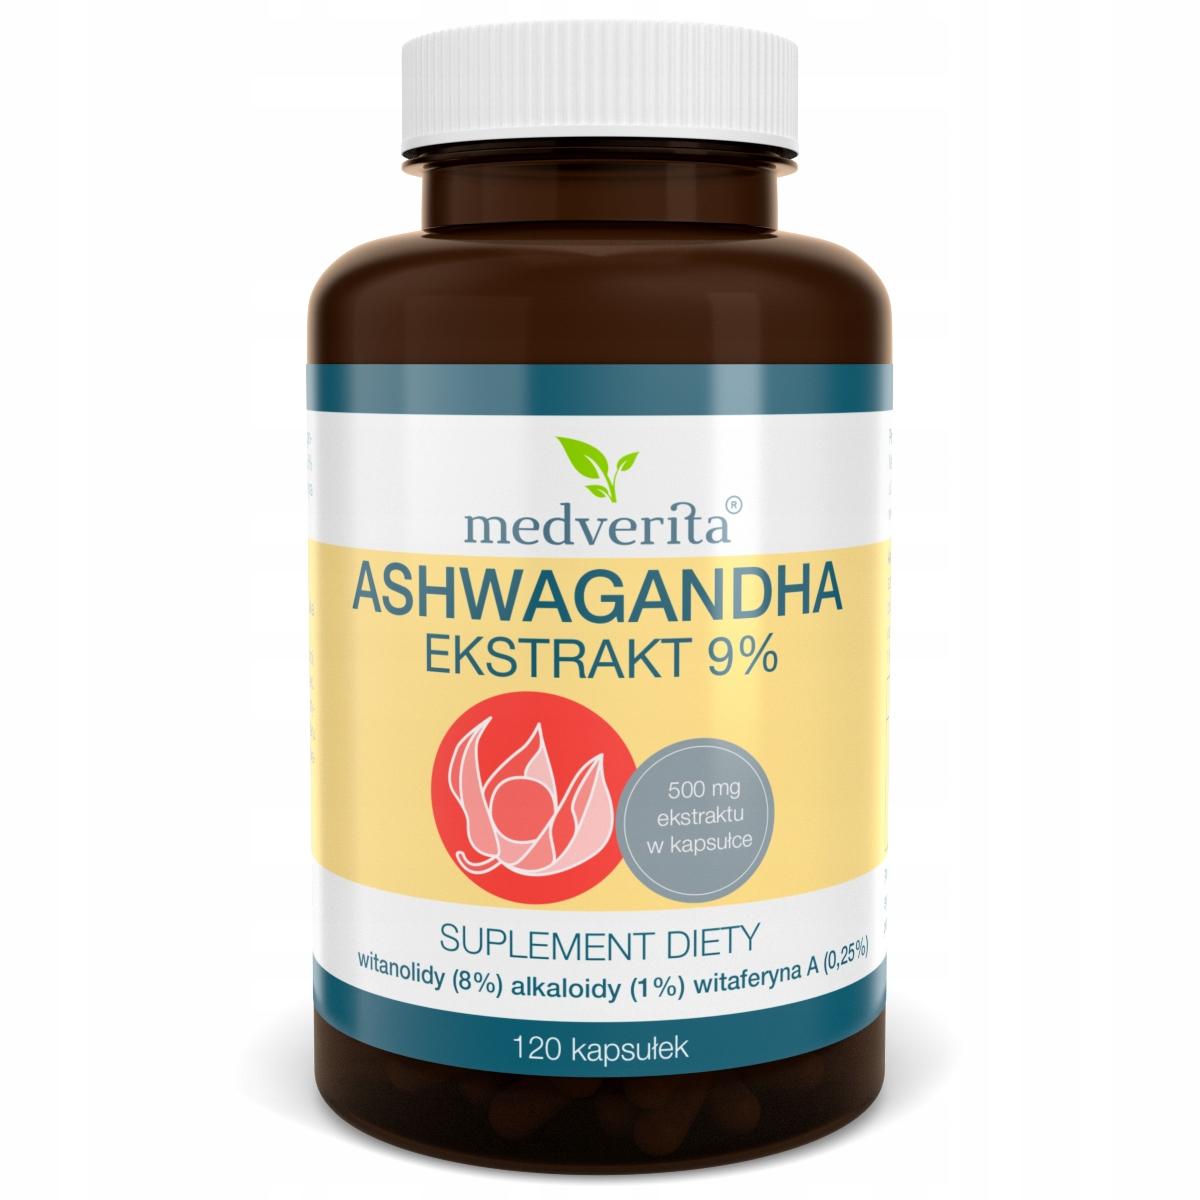 ASHWAGANDHA Ekstrakt 9% witanolidy żeń-szeń 120 k